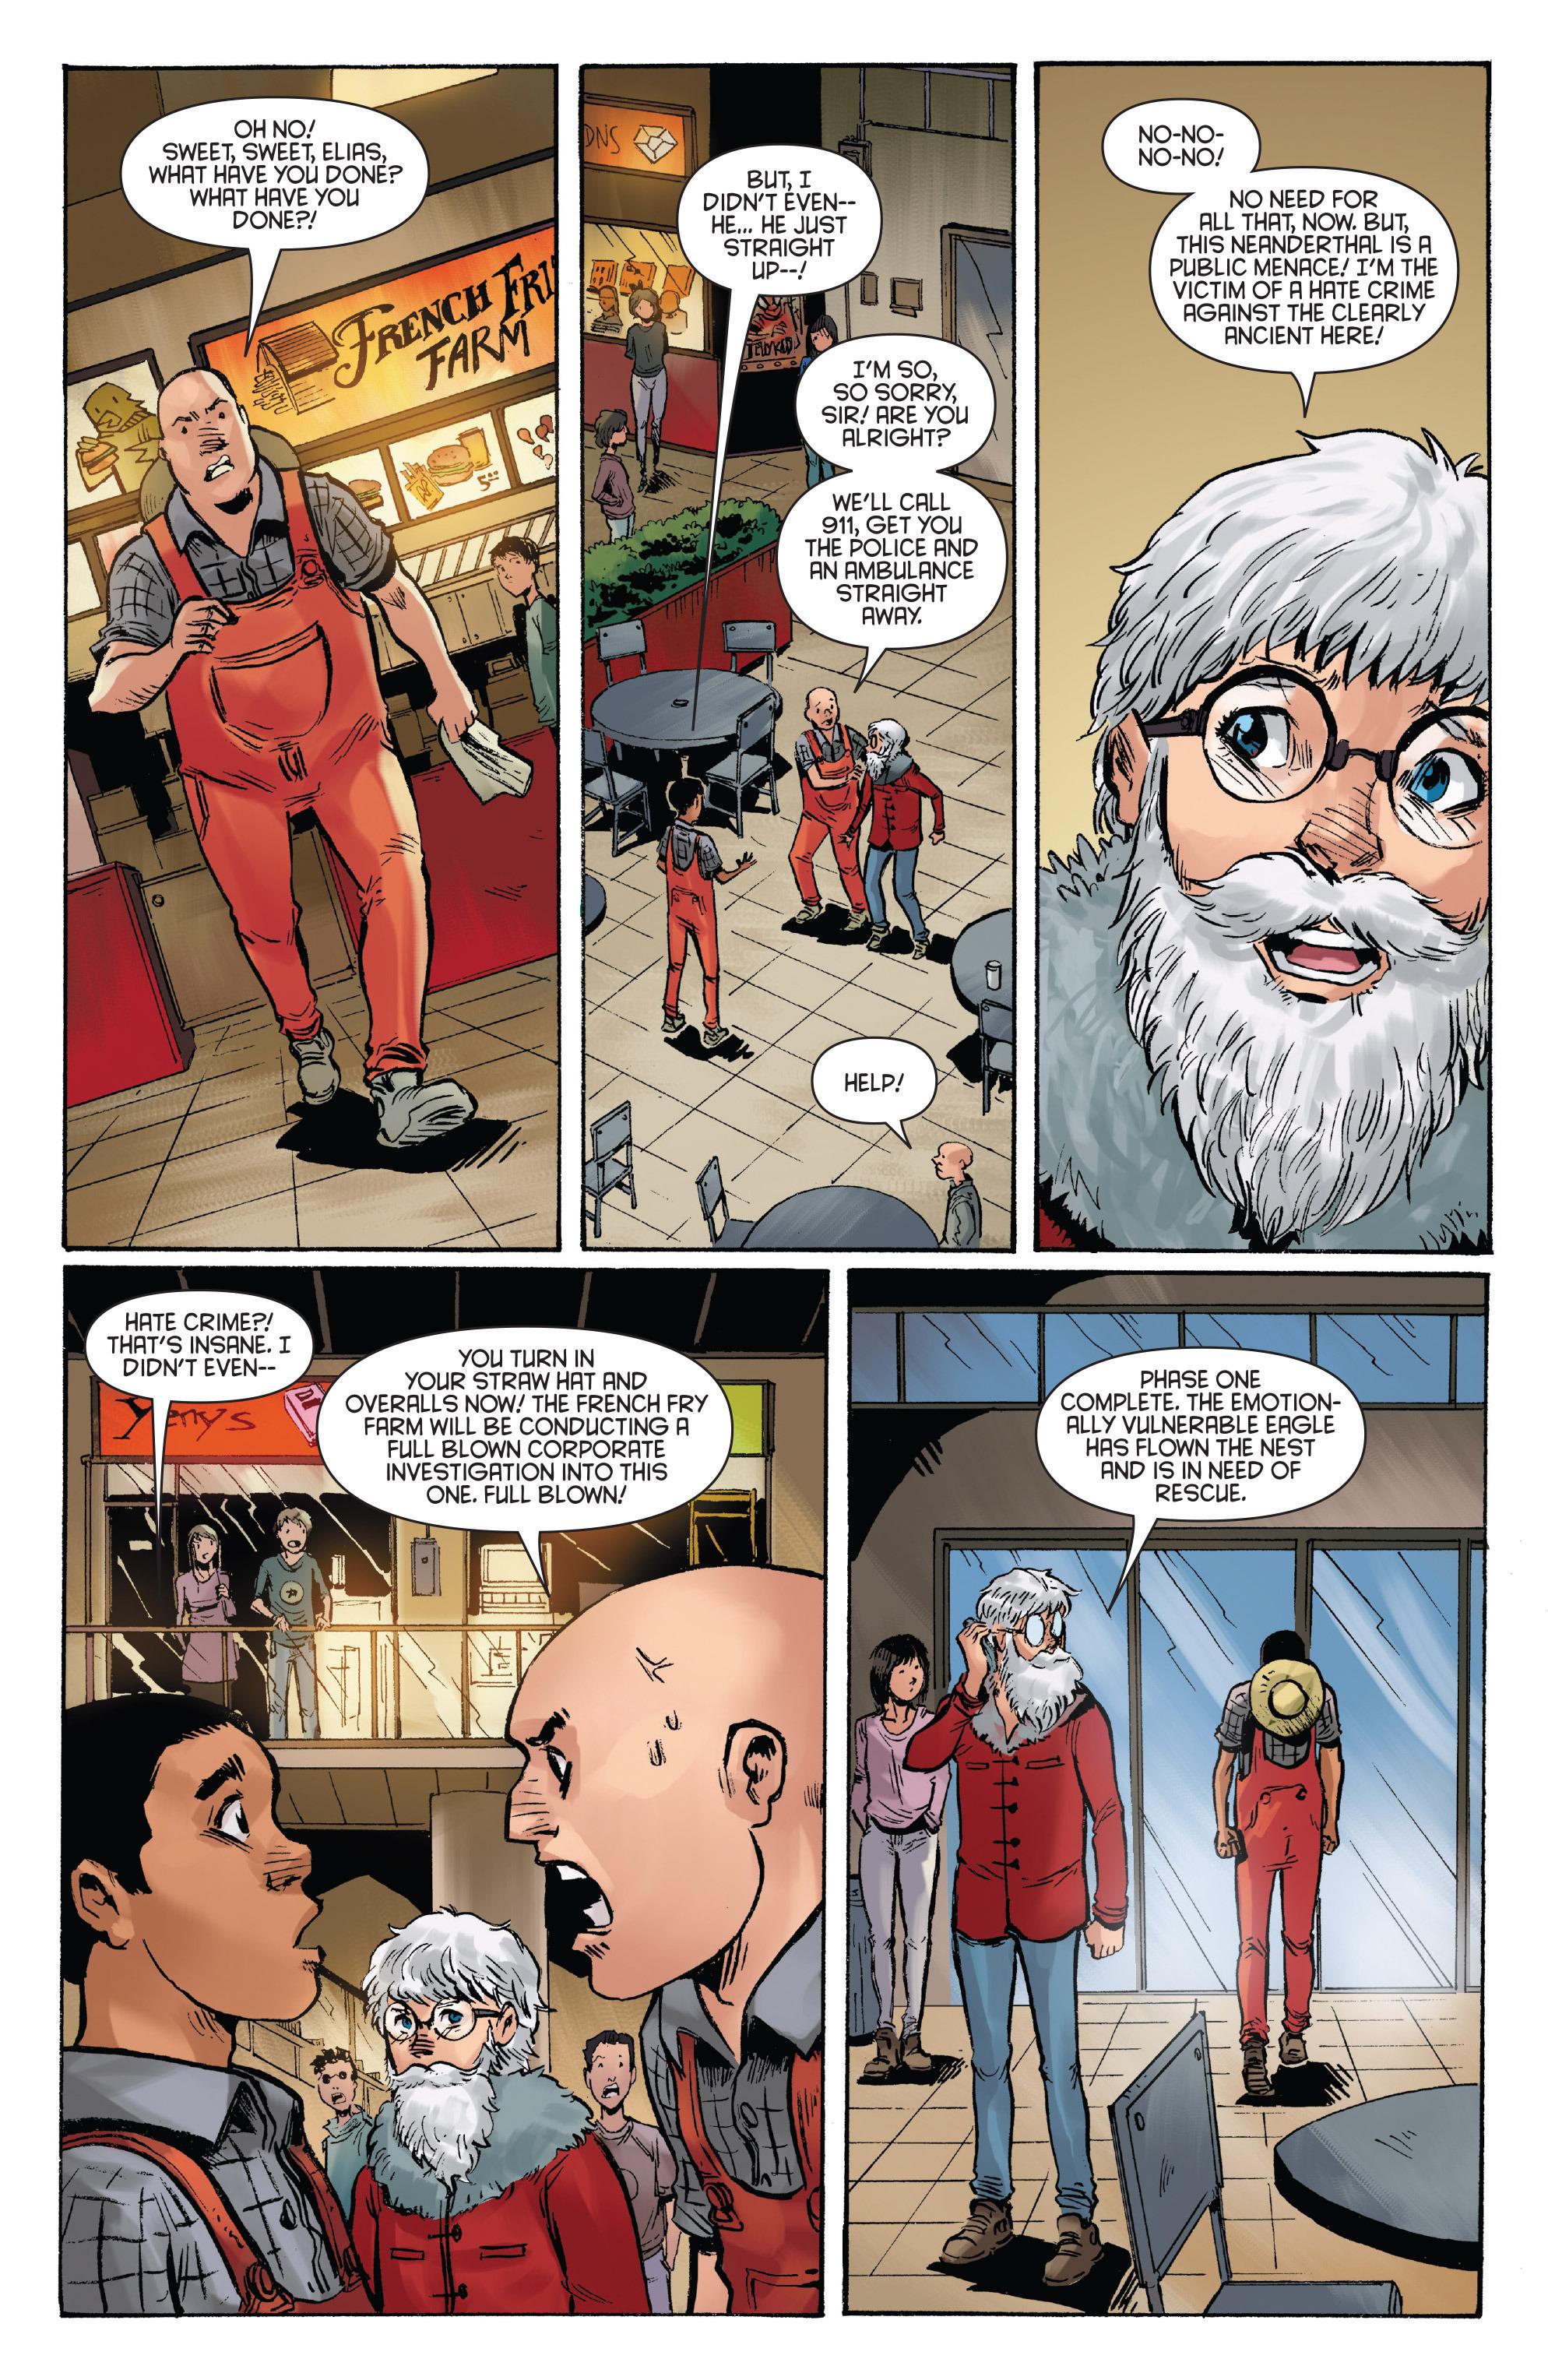 Read online Smosh comic -  Issue #2 - 10